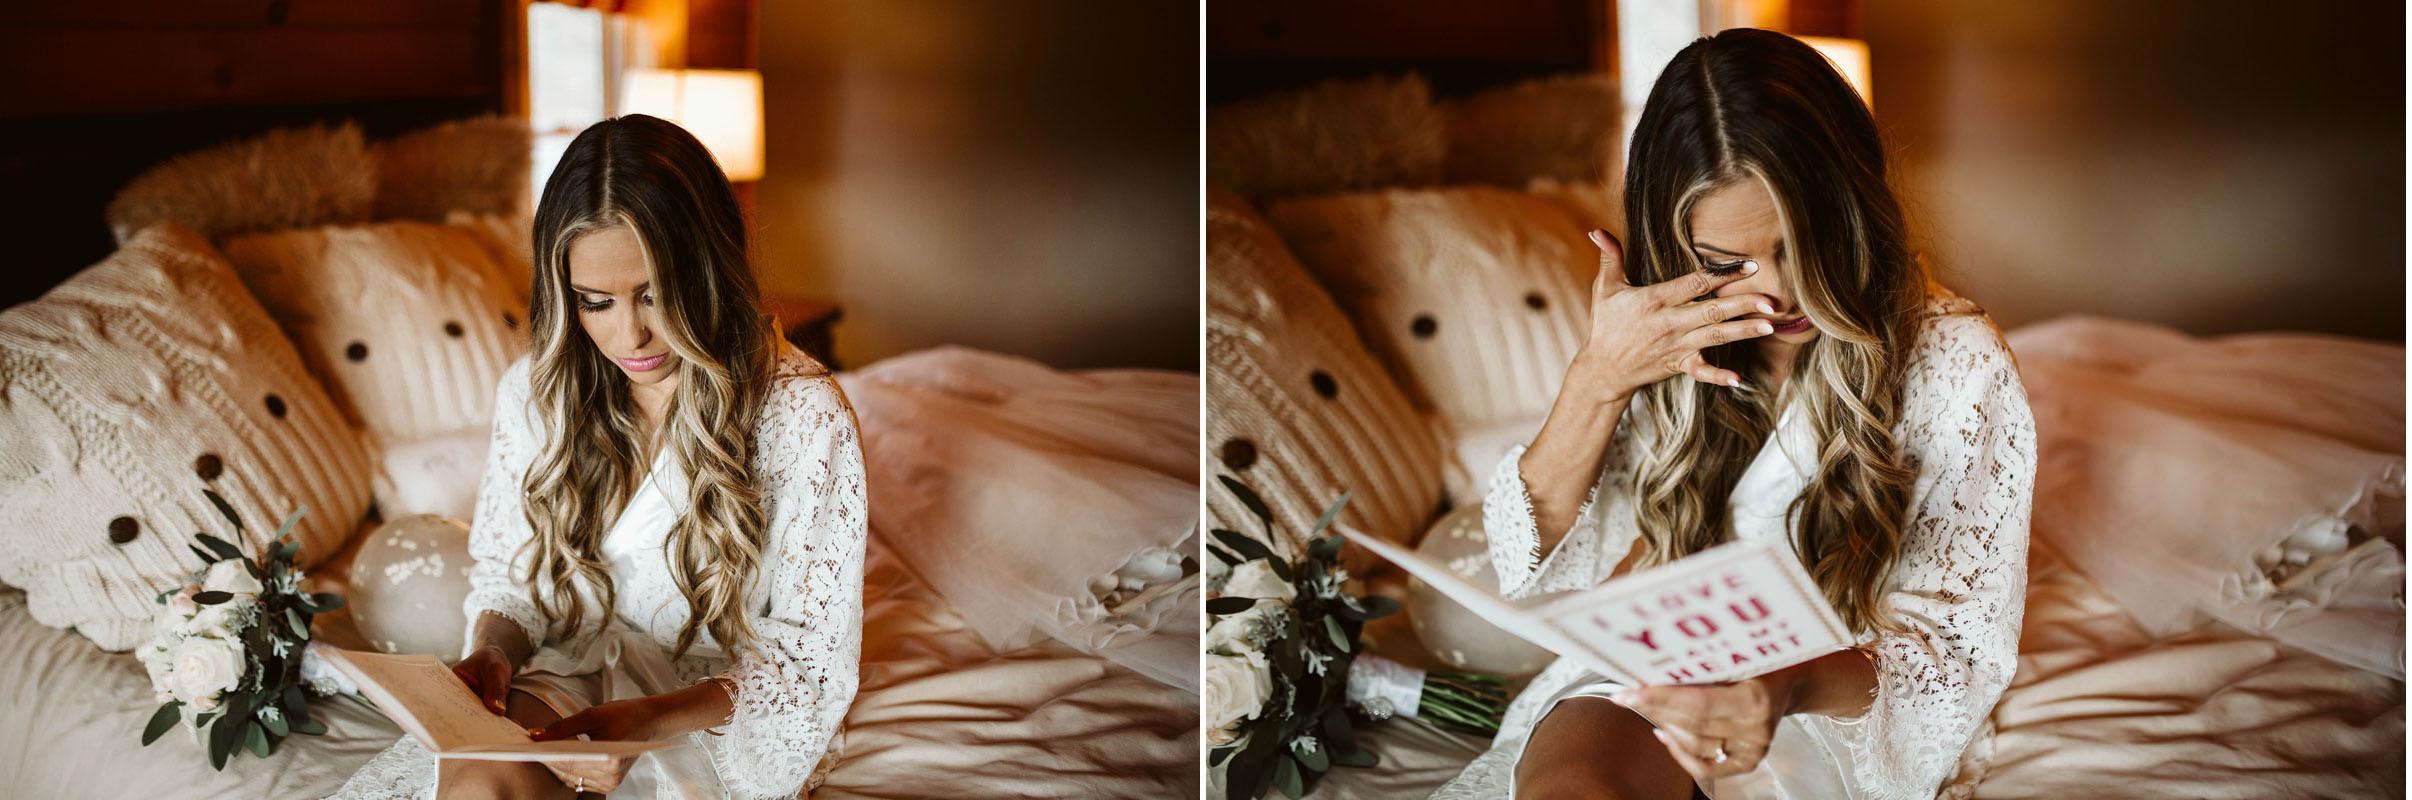 intimate-elopment-blue-ridge-georgia-north-georgia-wedding-photographers (26).jpg